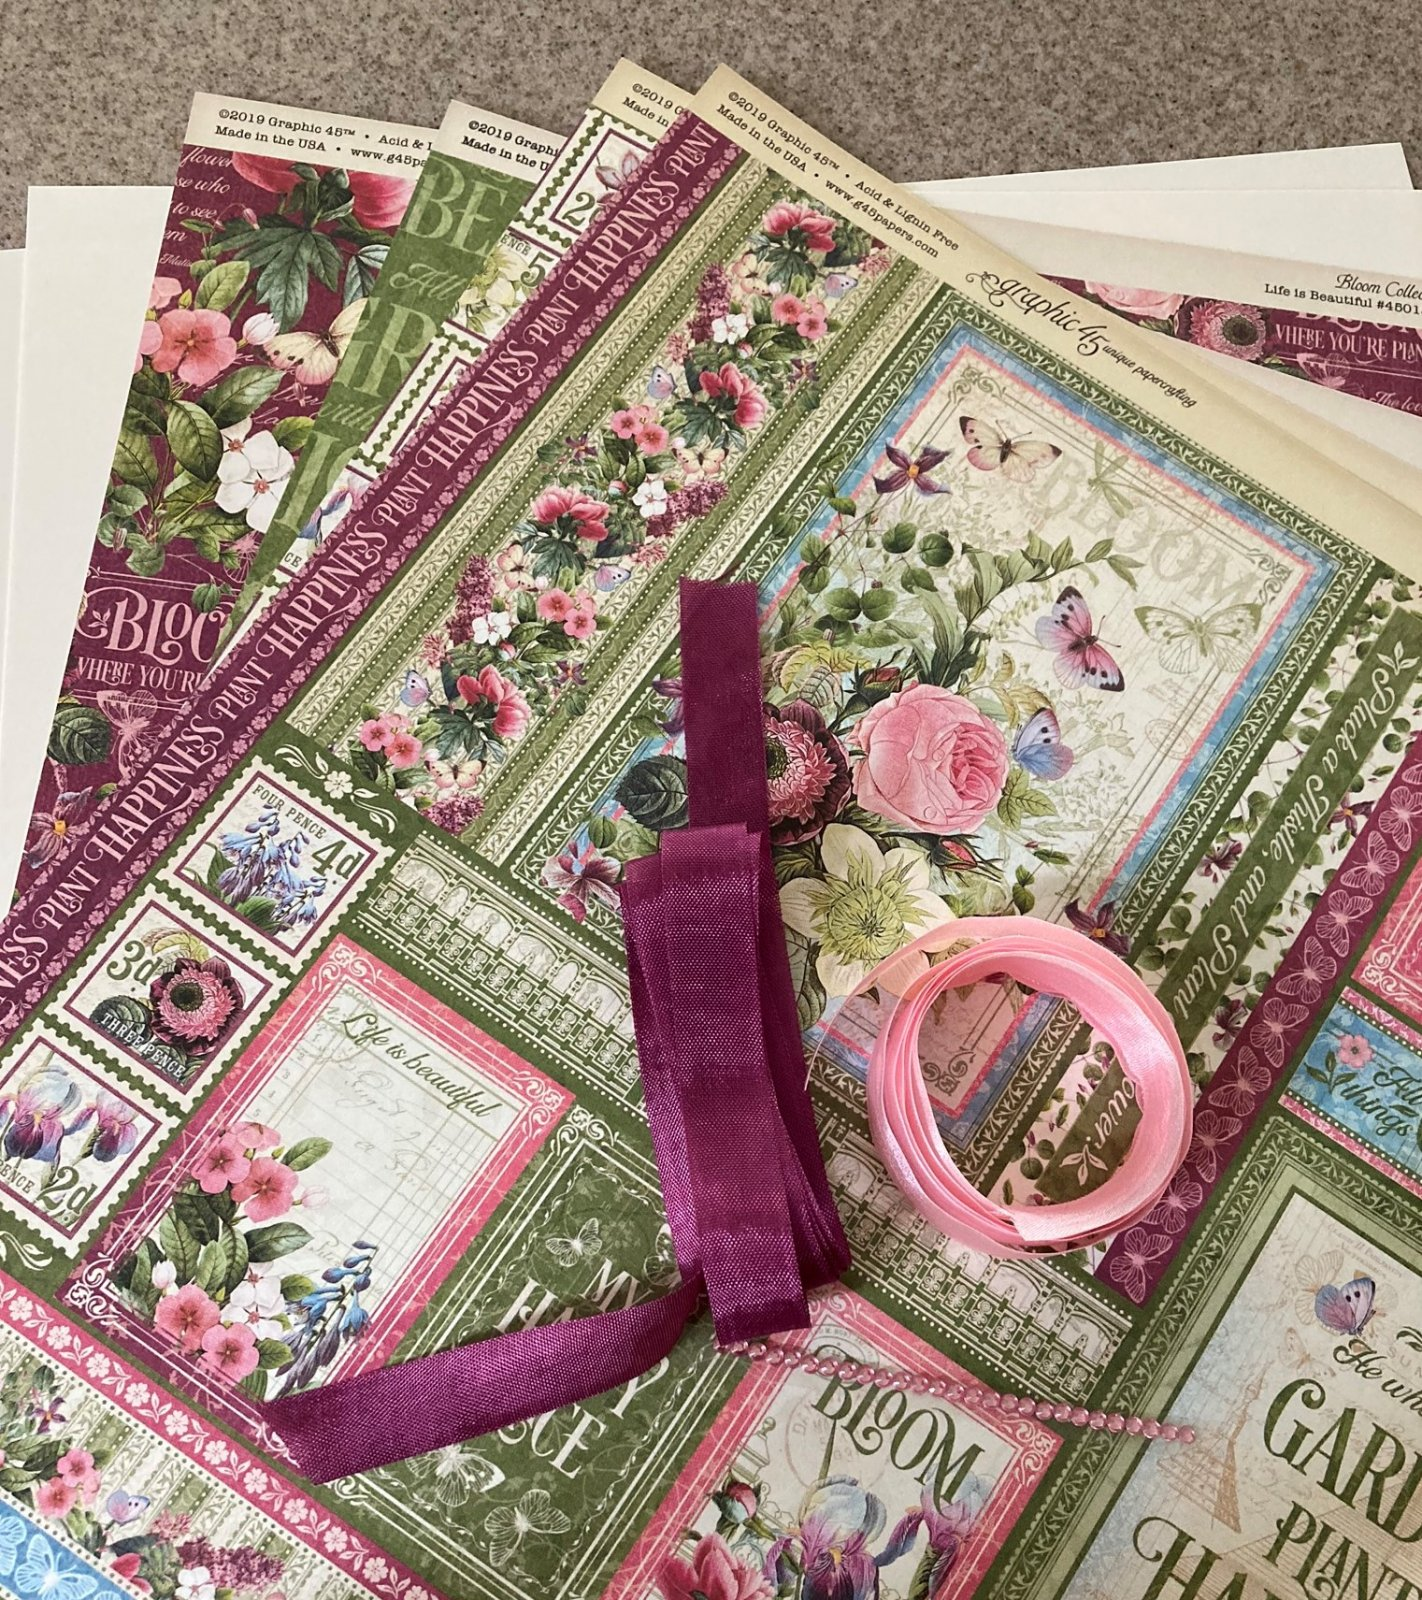 Graphic 45 Bloom paper/embellishment kit